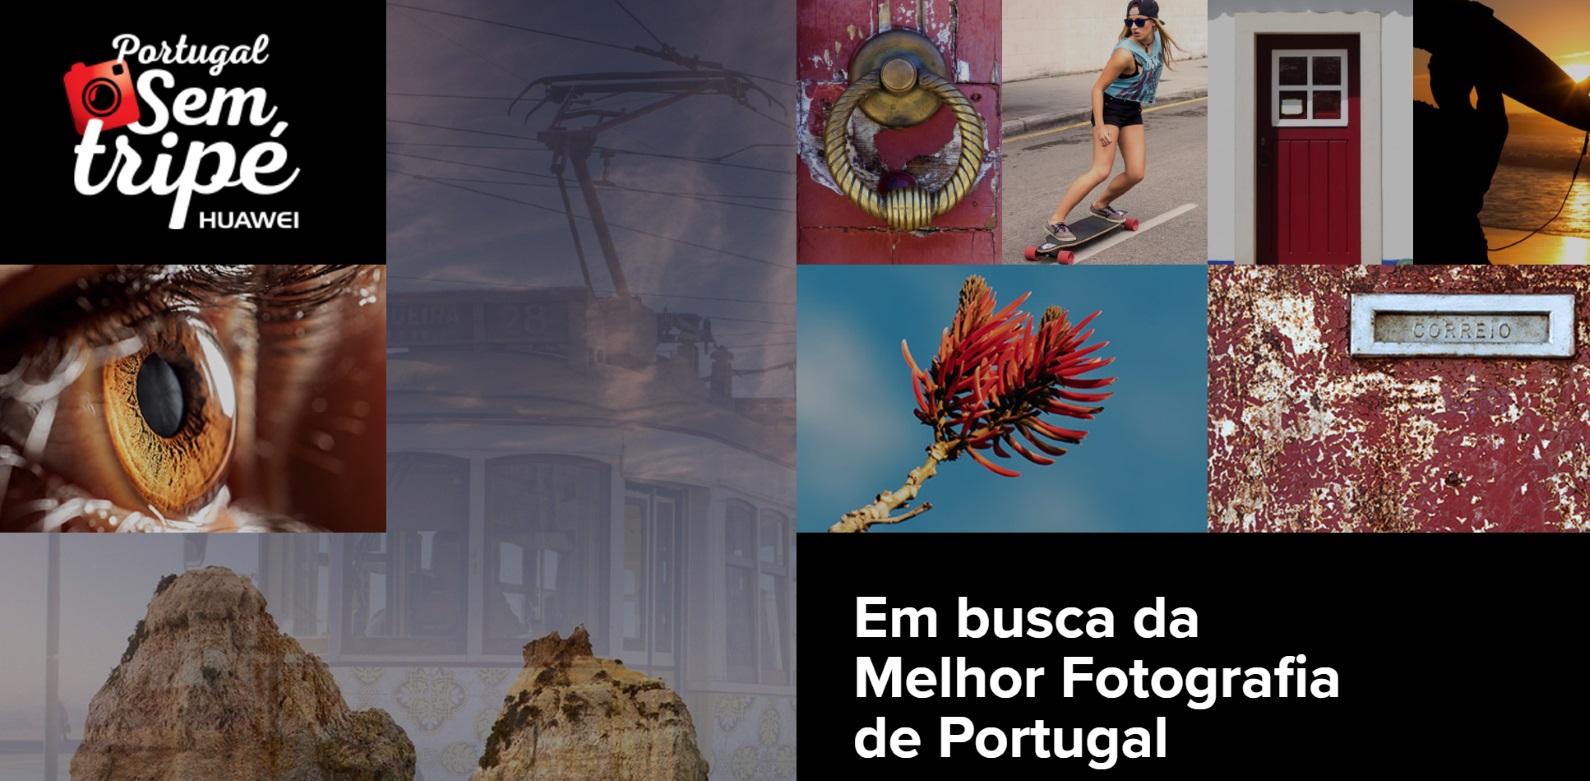 Portugal Sem Tripé